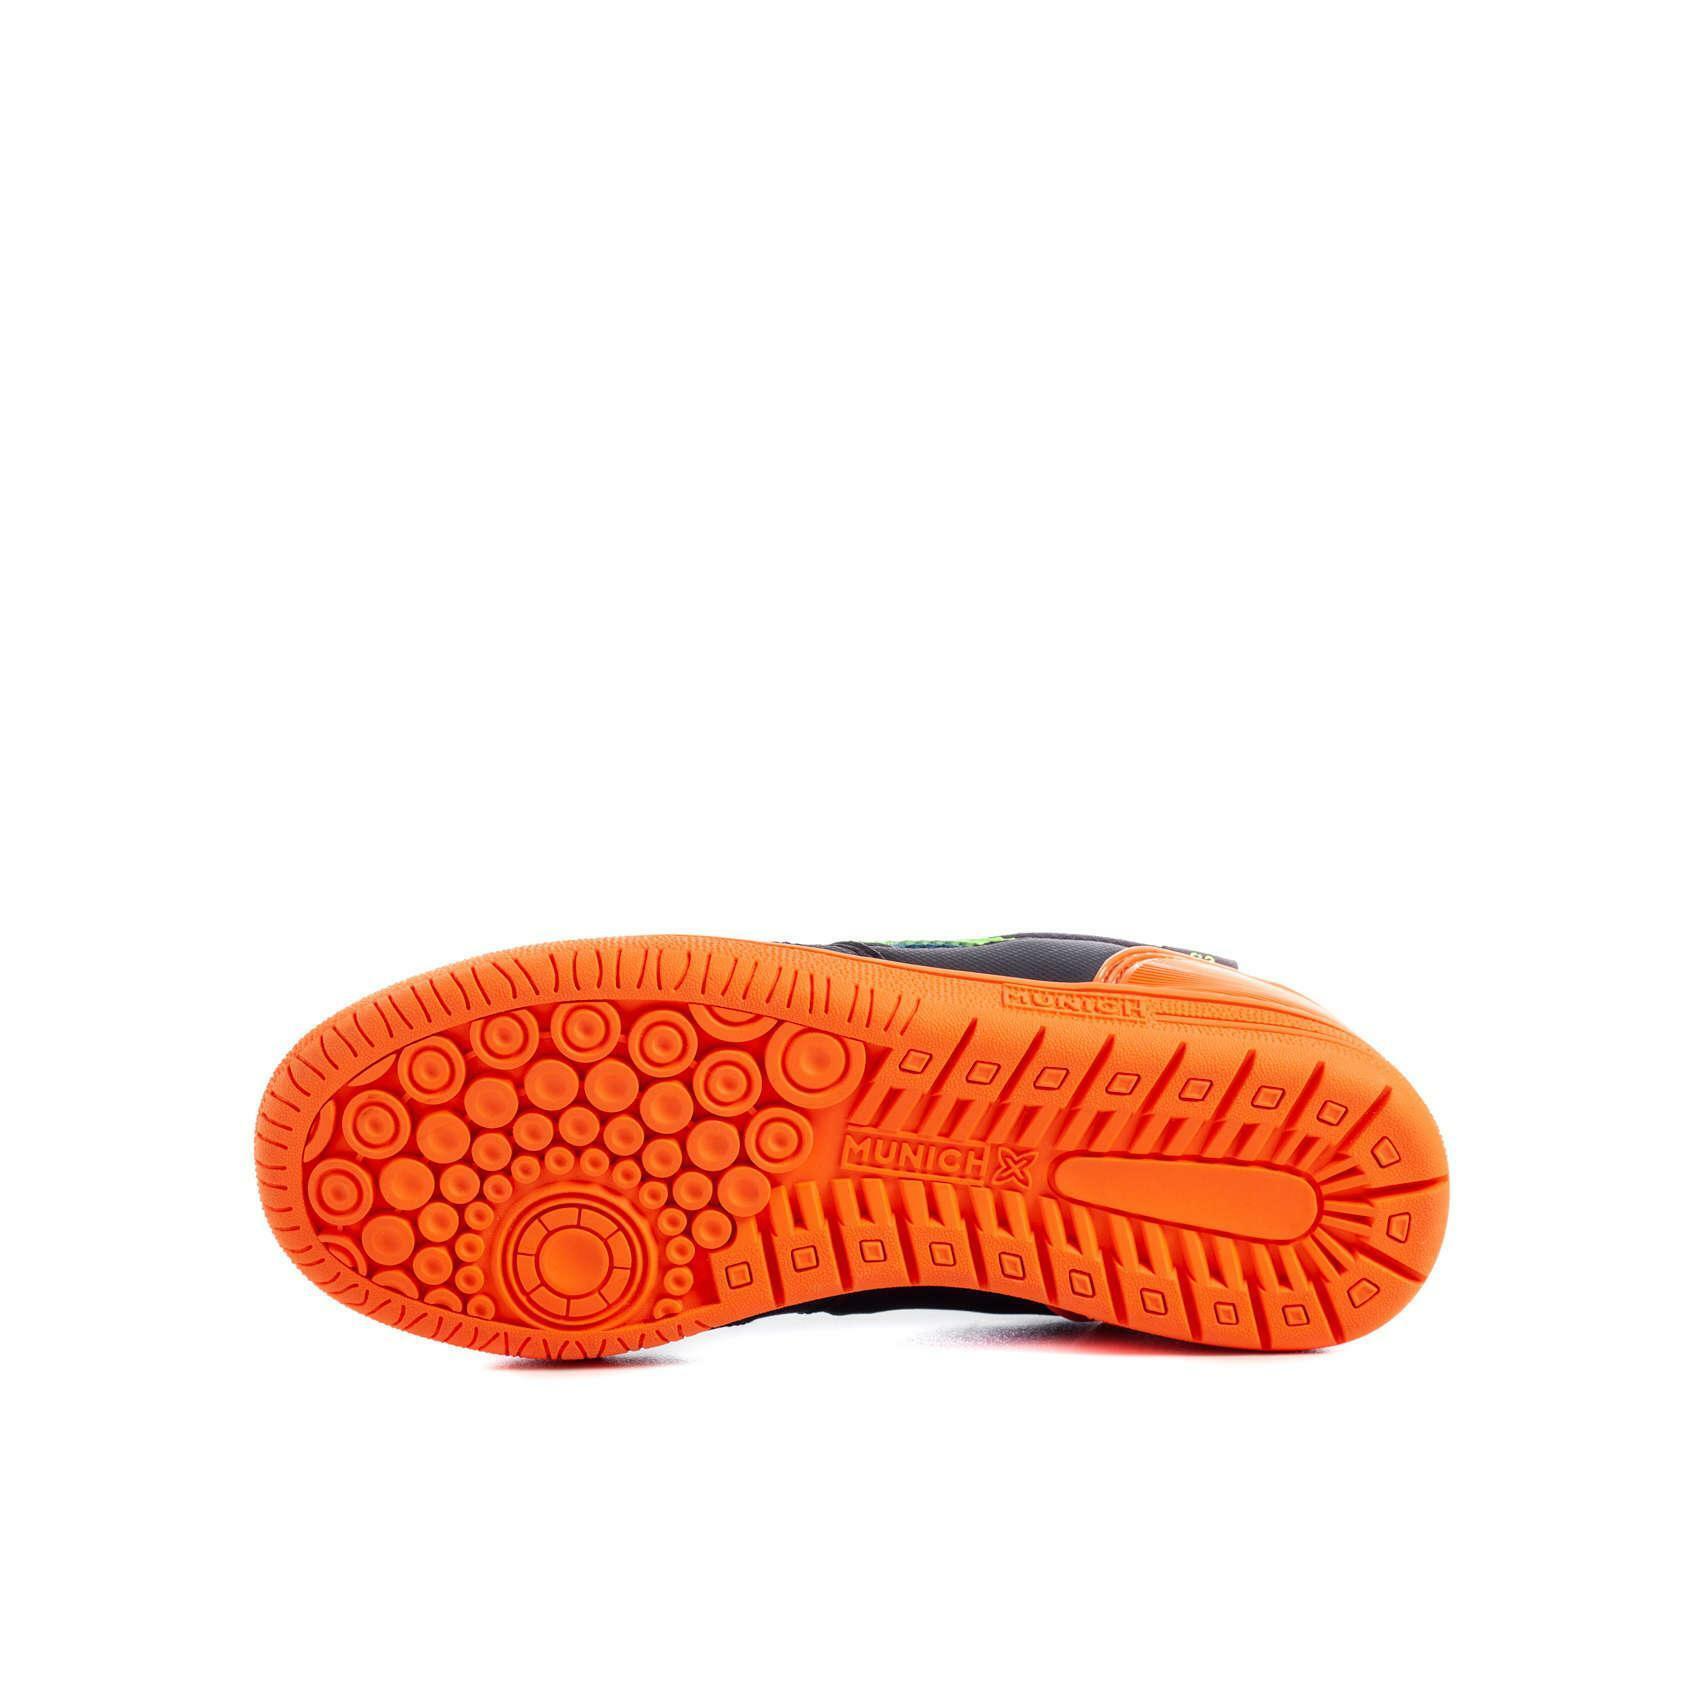 munich munich scarpa calcetto bambino g-3 kid profit blu/arancio